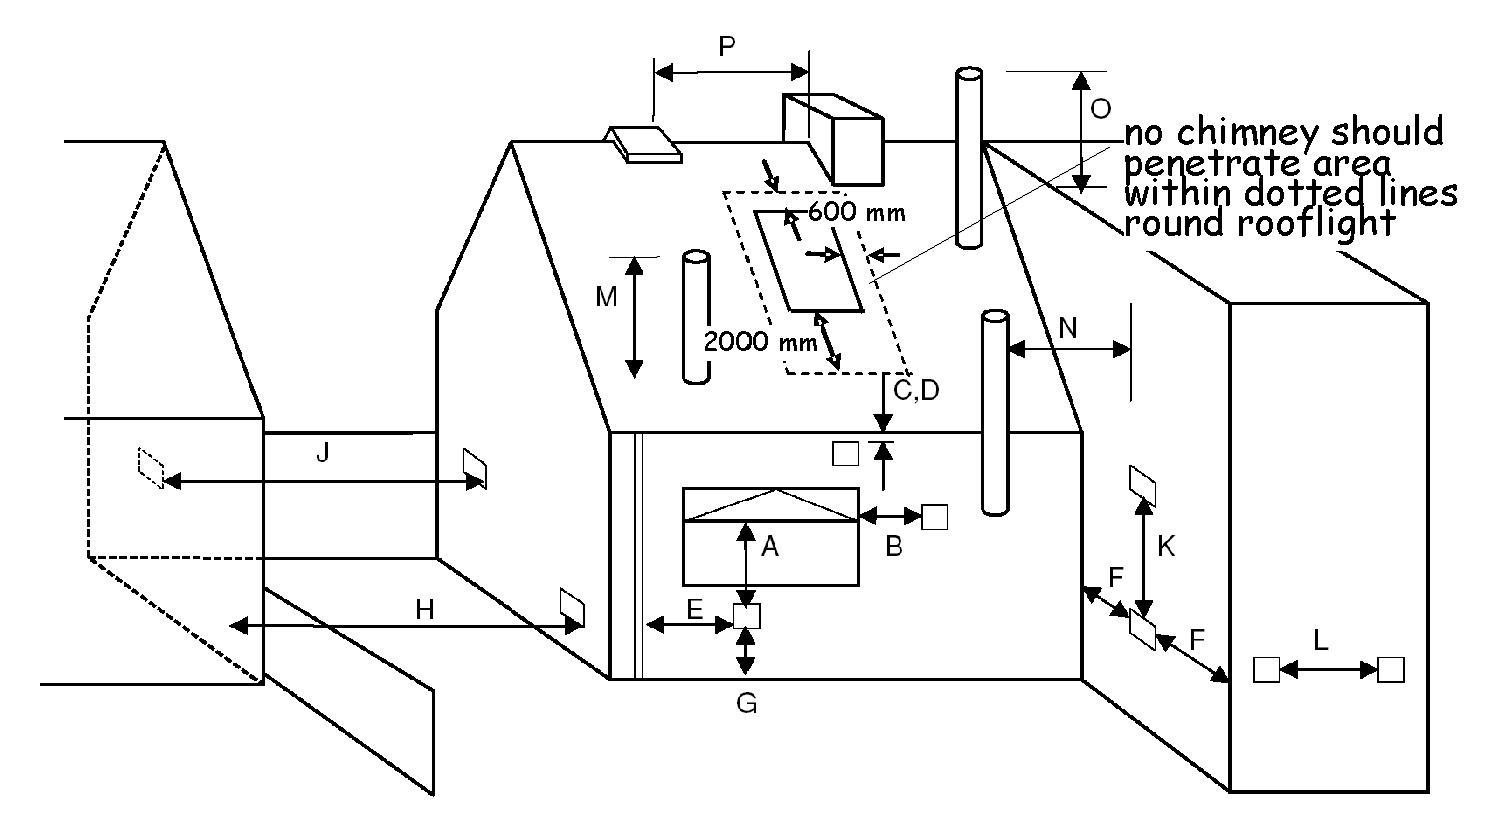 hight resolution of oil firing flue outlets